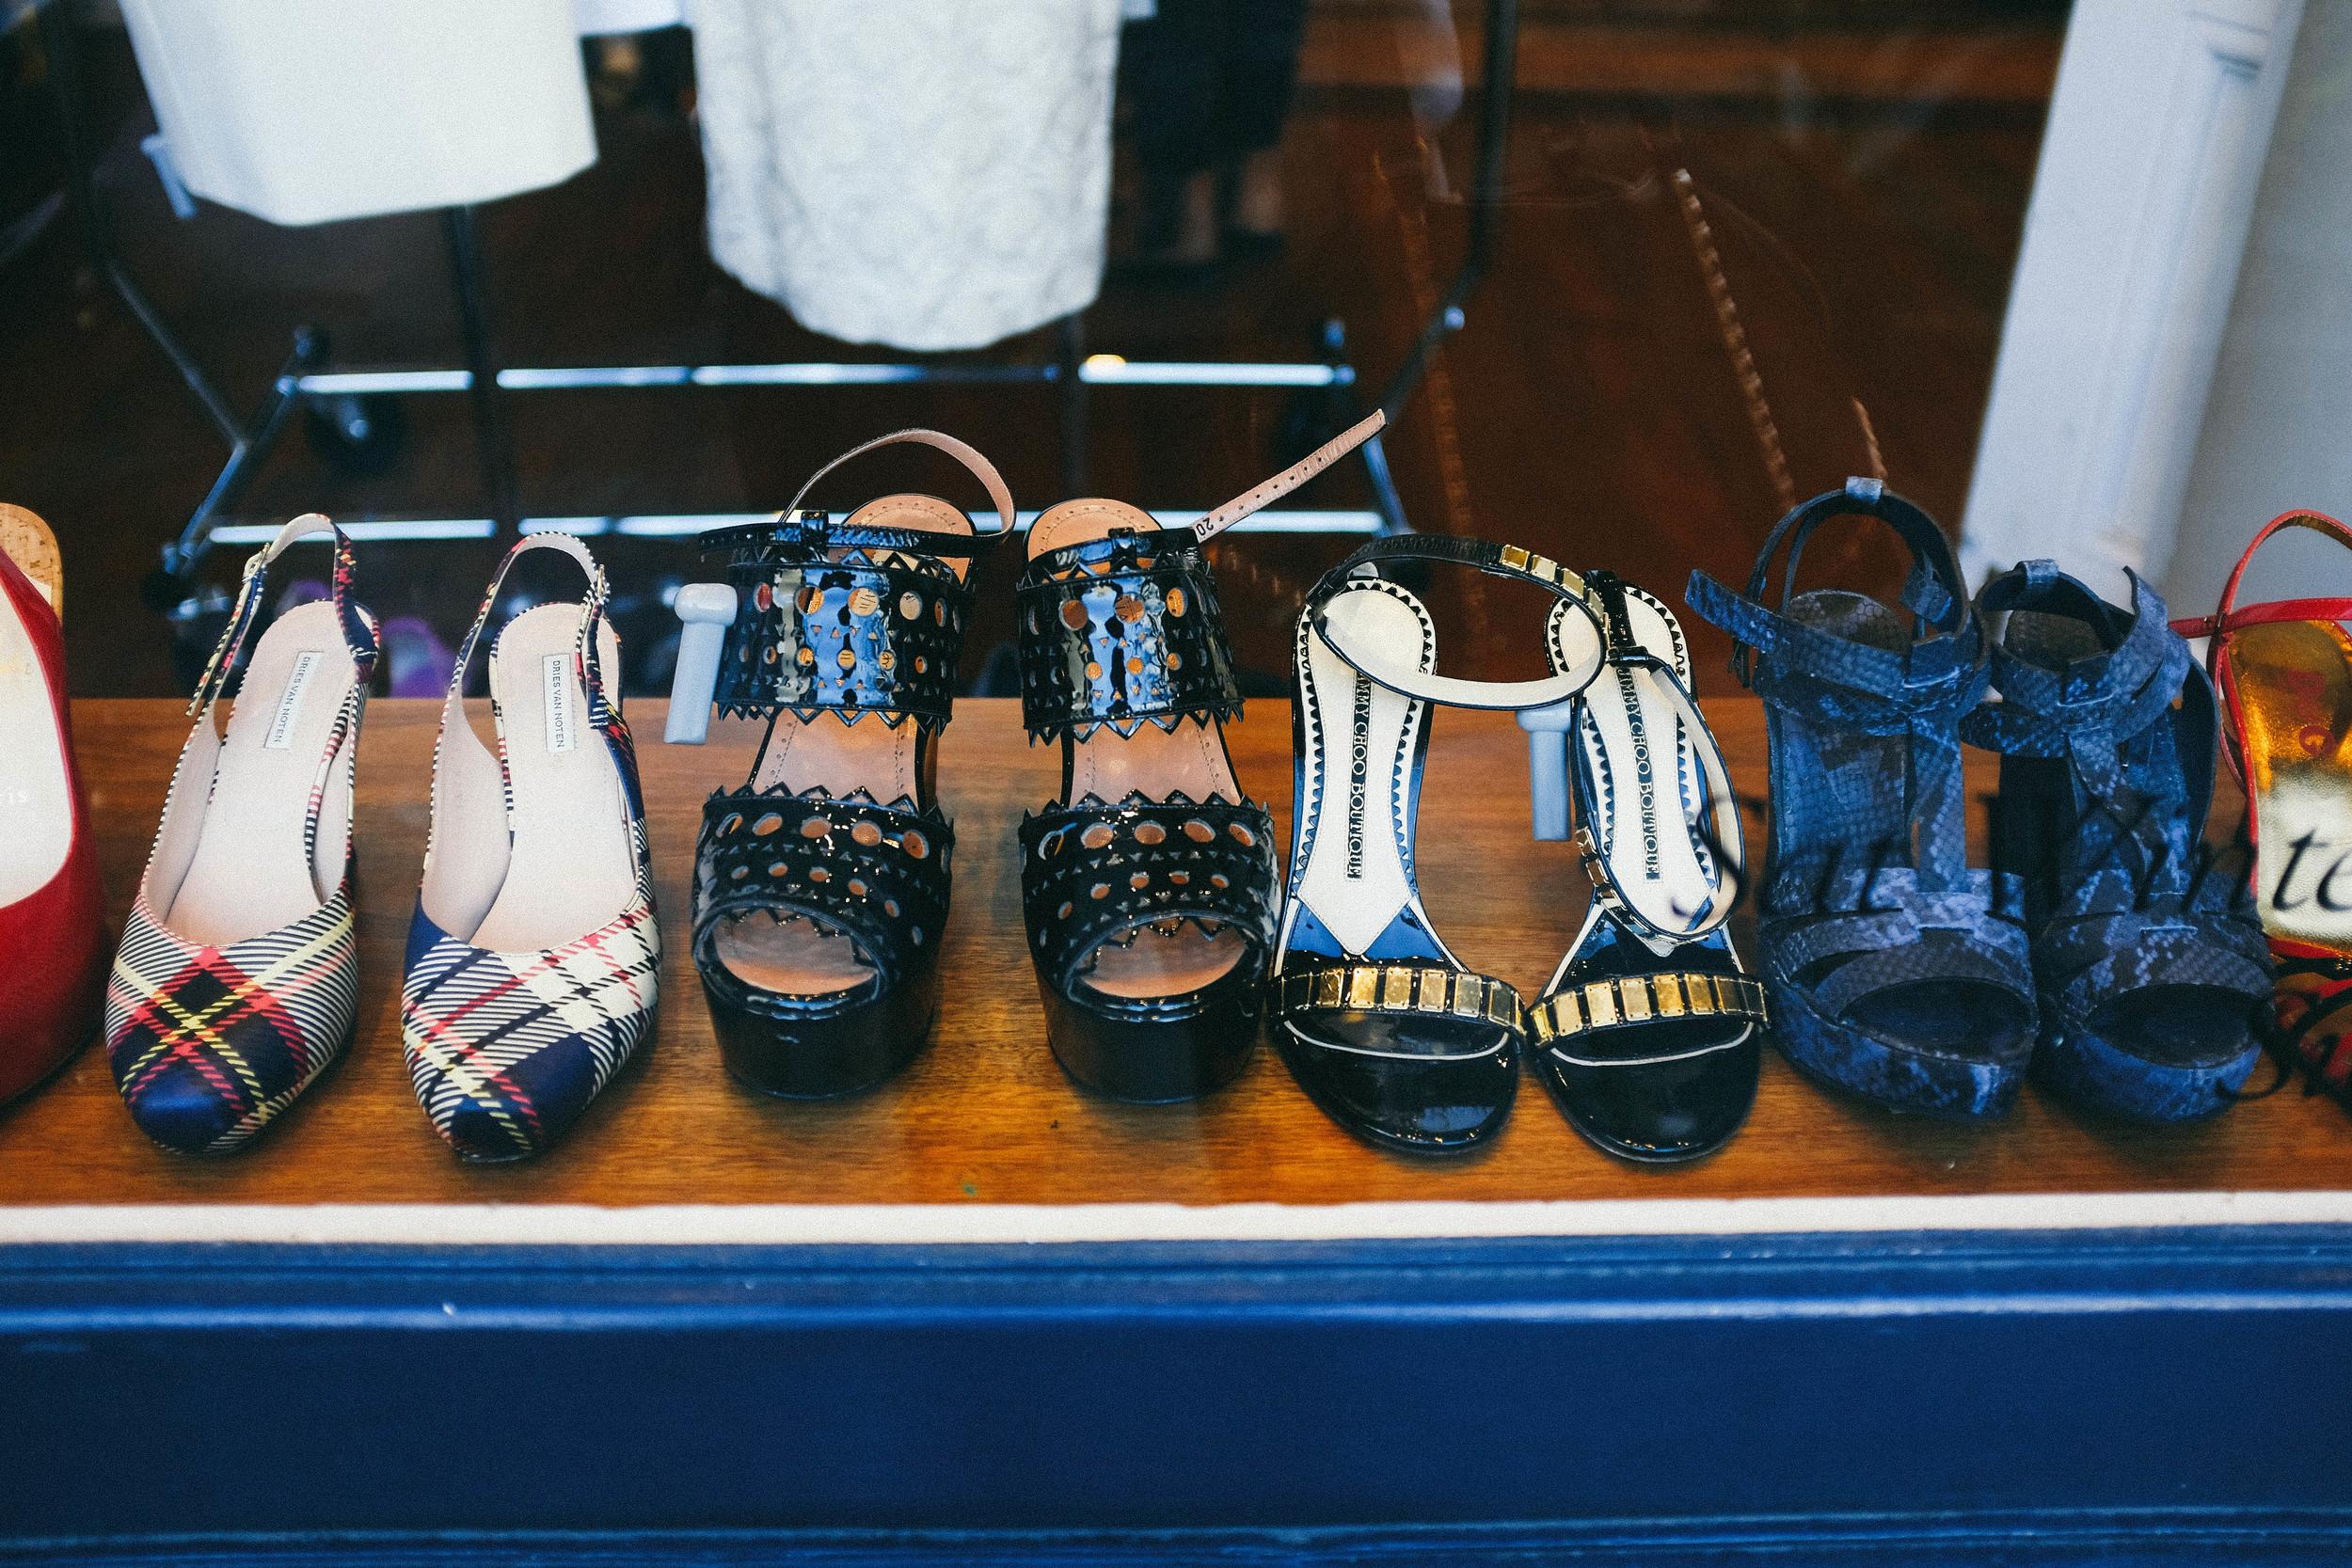 shoes in shop window